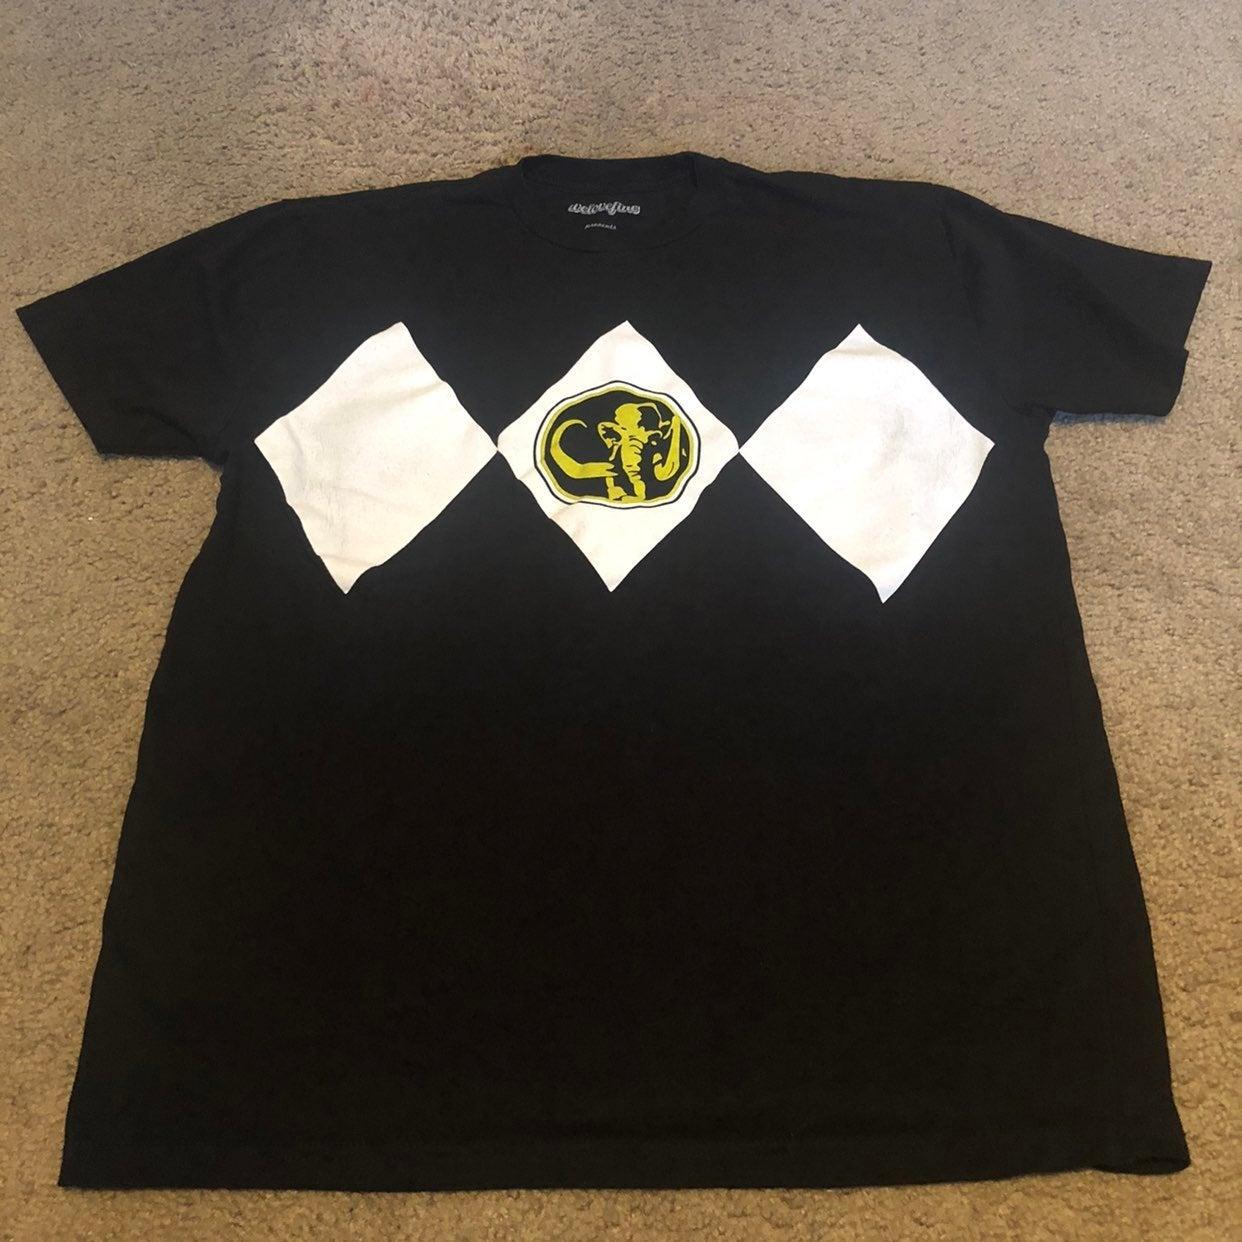 Black power ranger tshirt - large